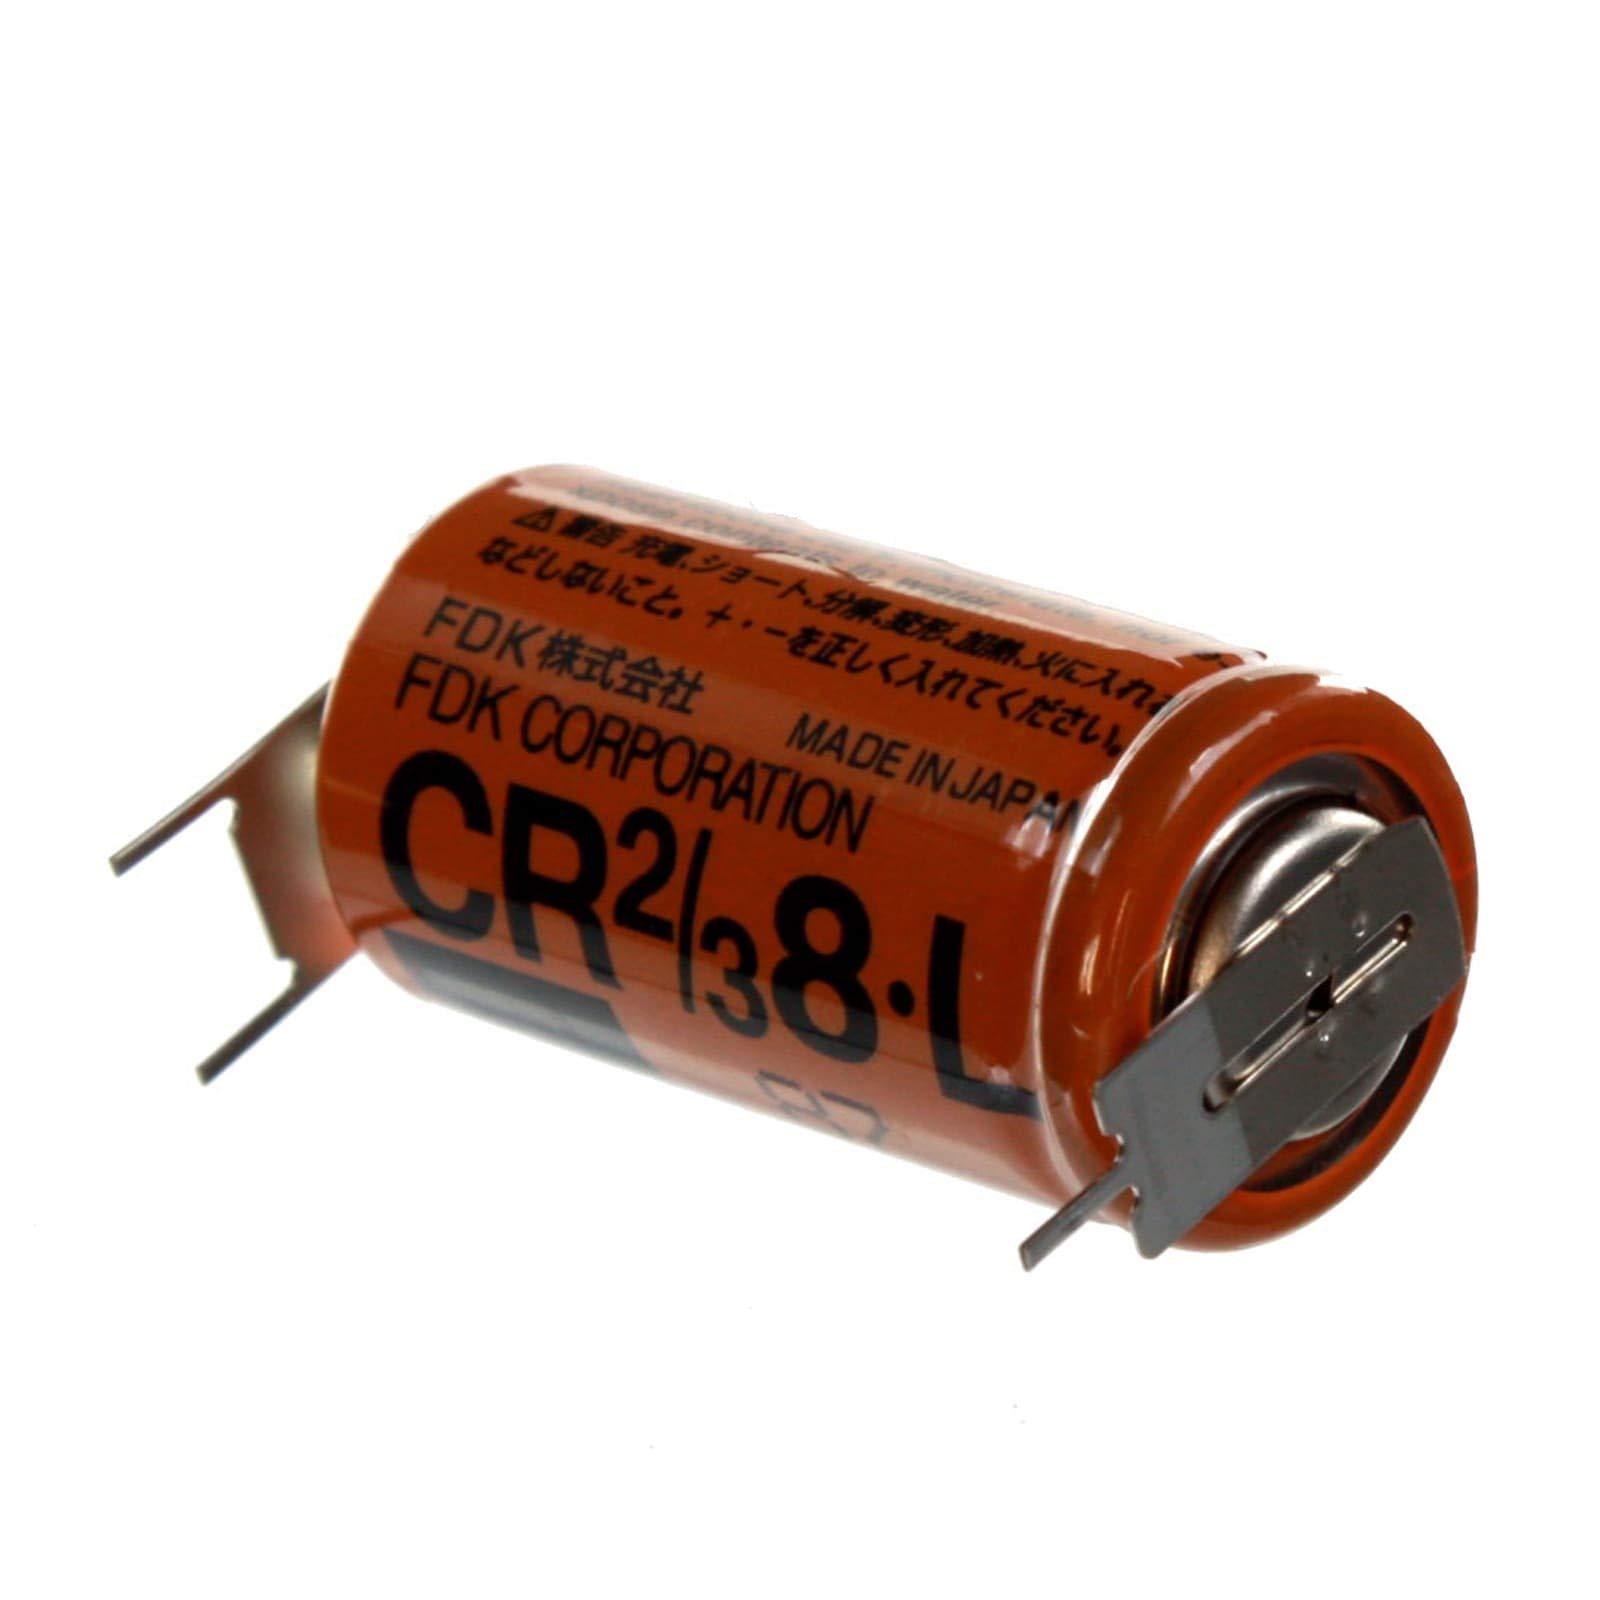 FRESH Fuji 2/3 8L 3V Lithium Batteries ER17/33 equivalent Pin Tabs